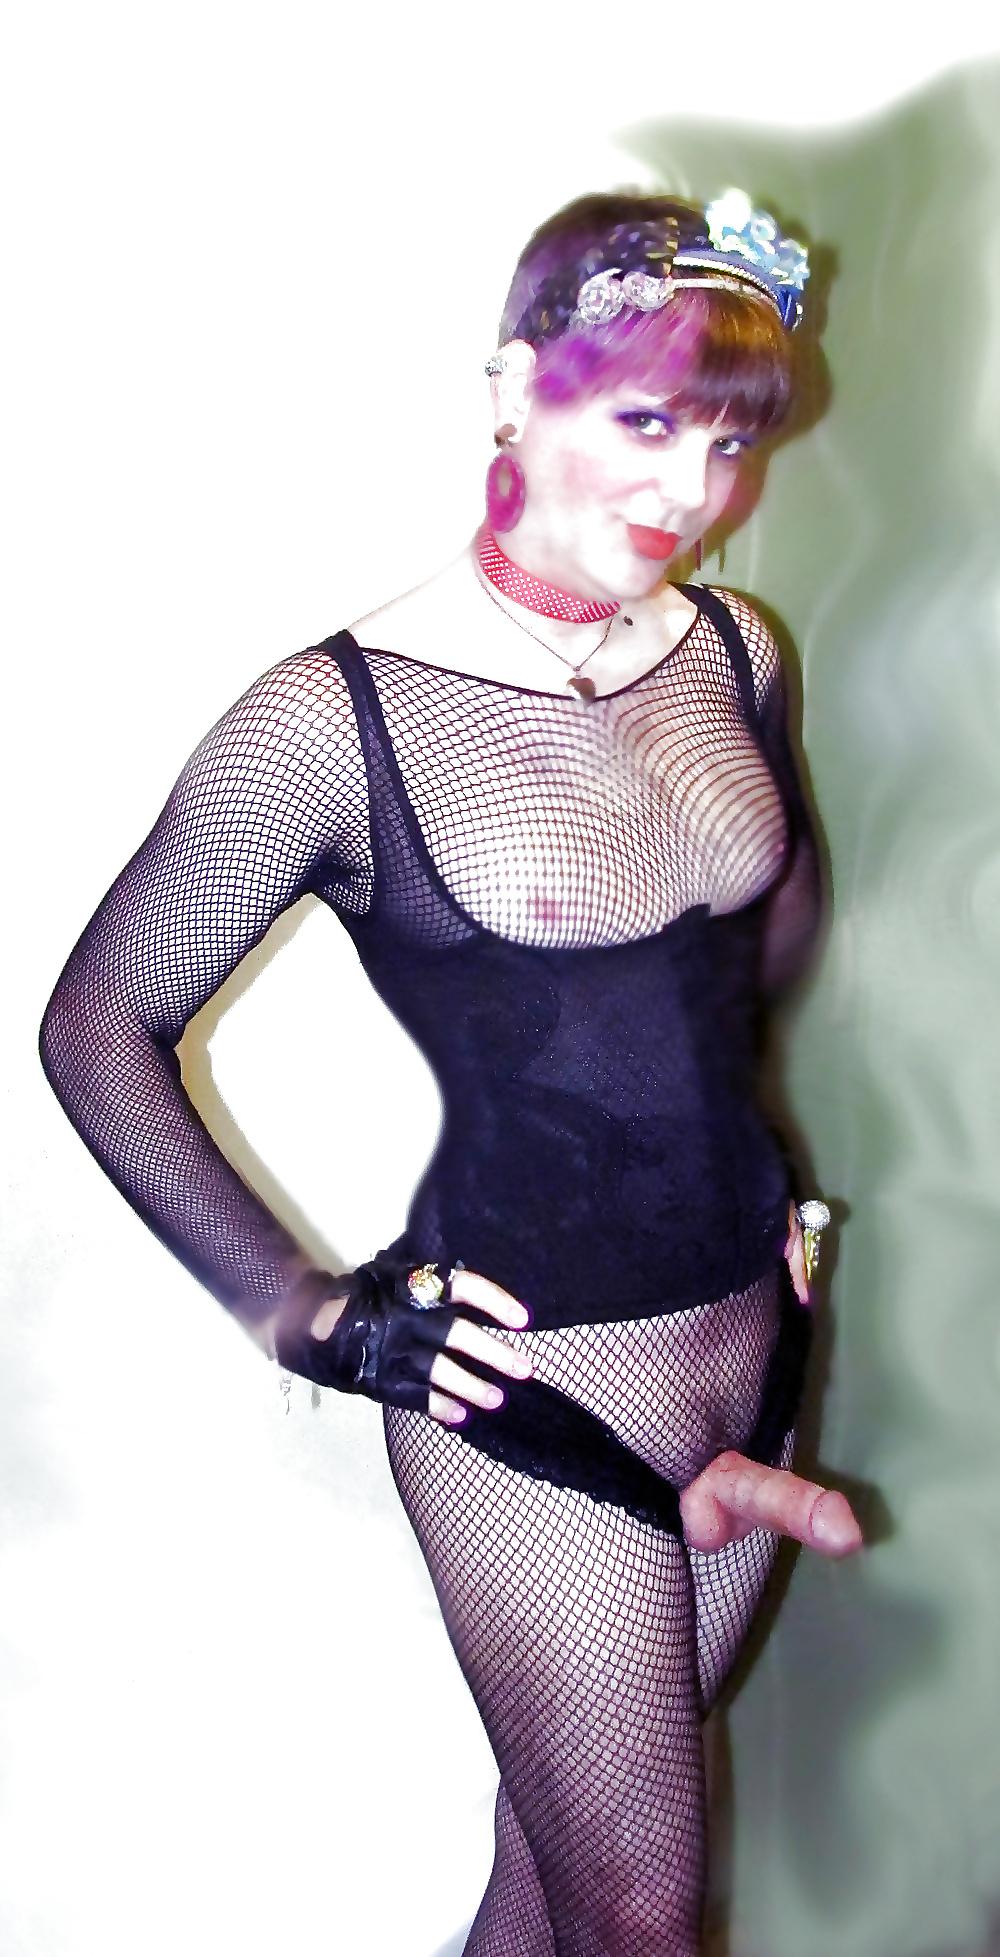 Kinky websites